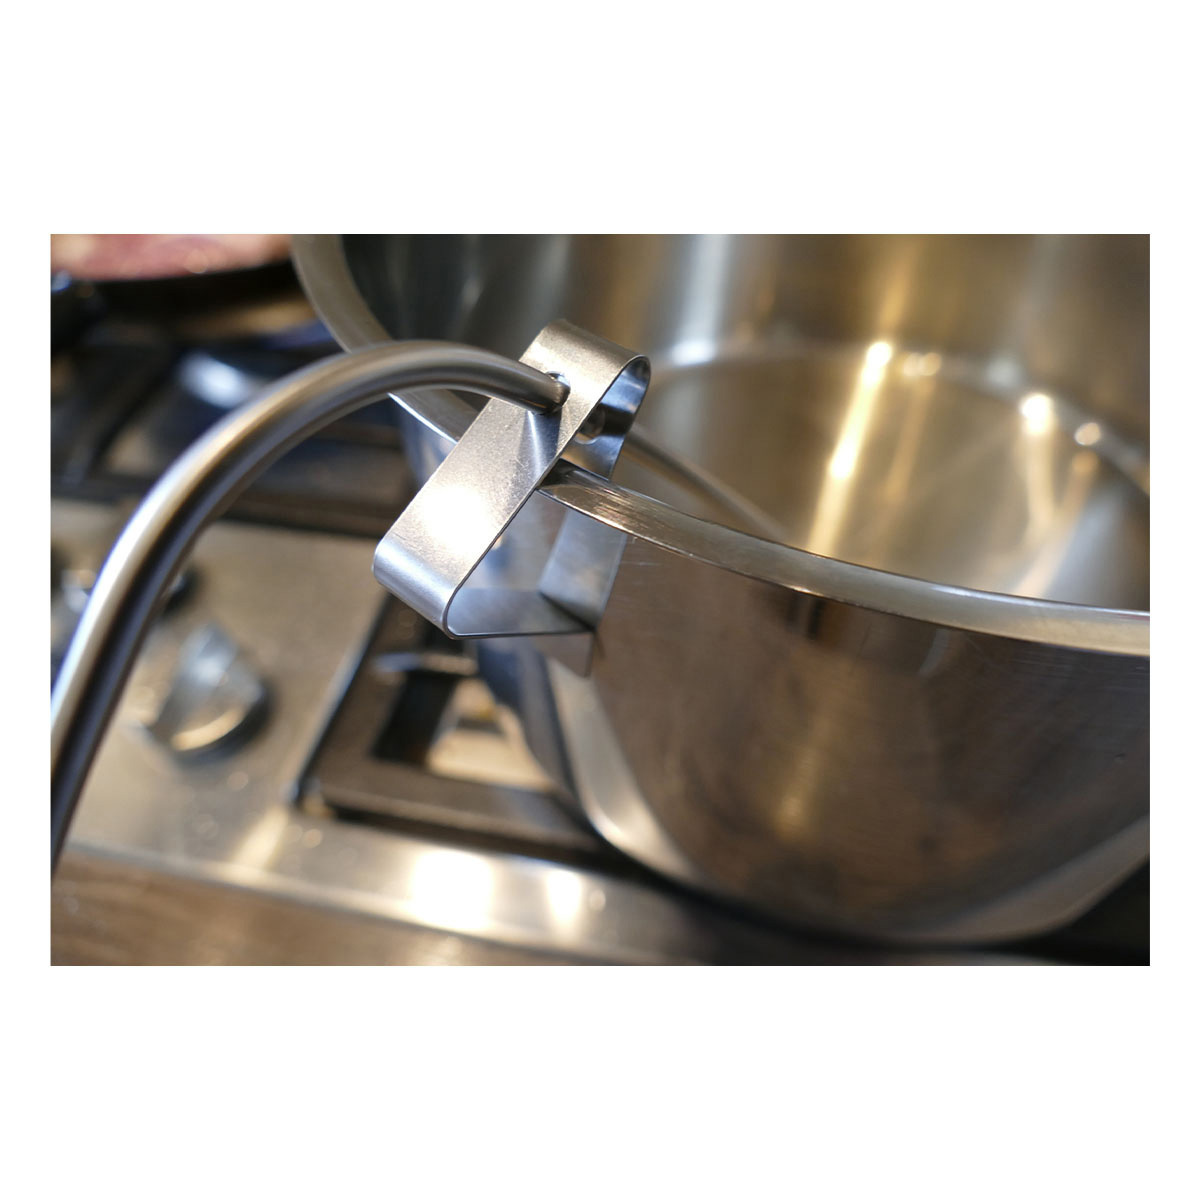 30-3525-60-clips-für-grill-bratenthermometer-anwendung-topf1-1200x1200px.jpg